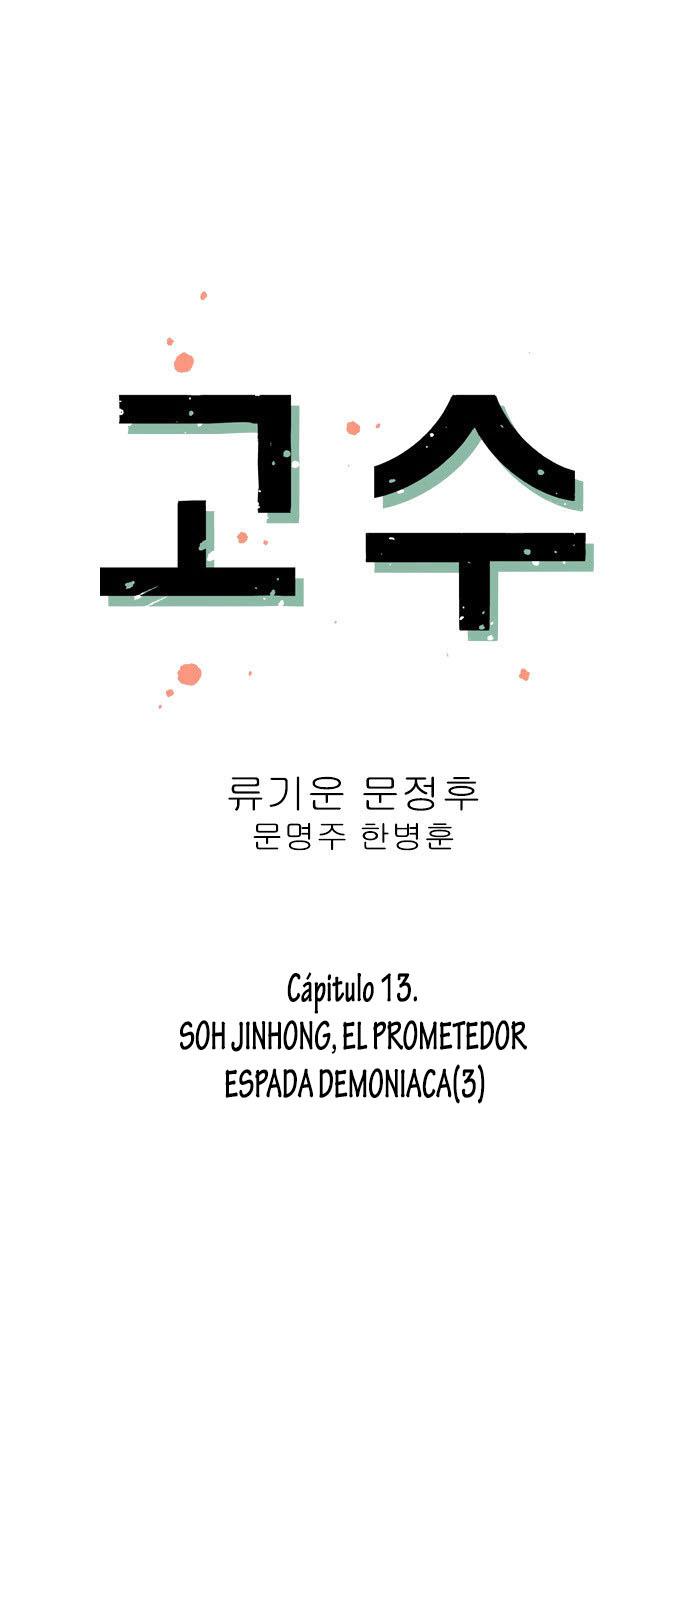 https://c5.ninemanga.com/es_manga/9/18249/449121/f8be302783f5687716aa964845de9bfa.jpg Page 2